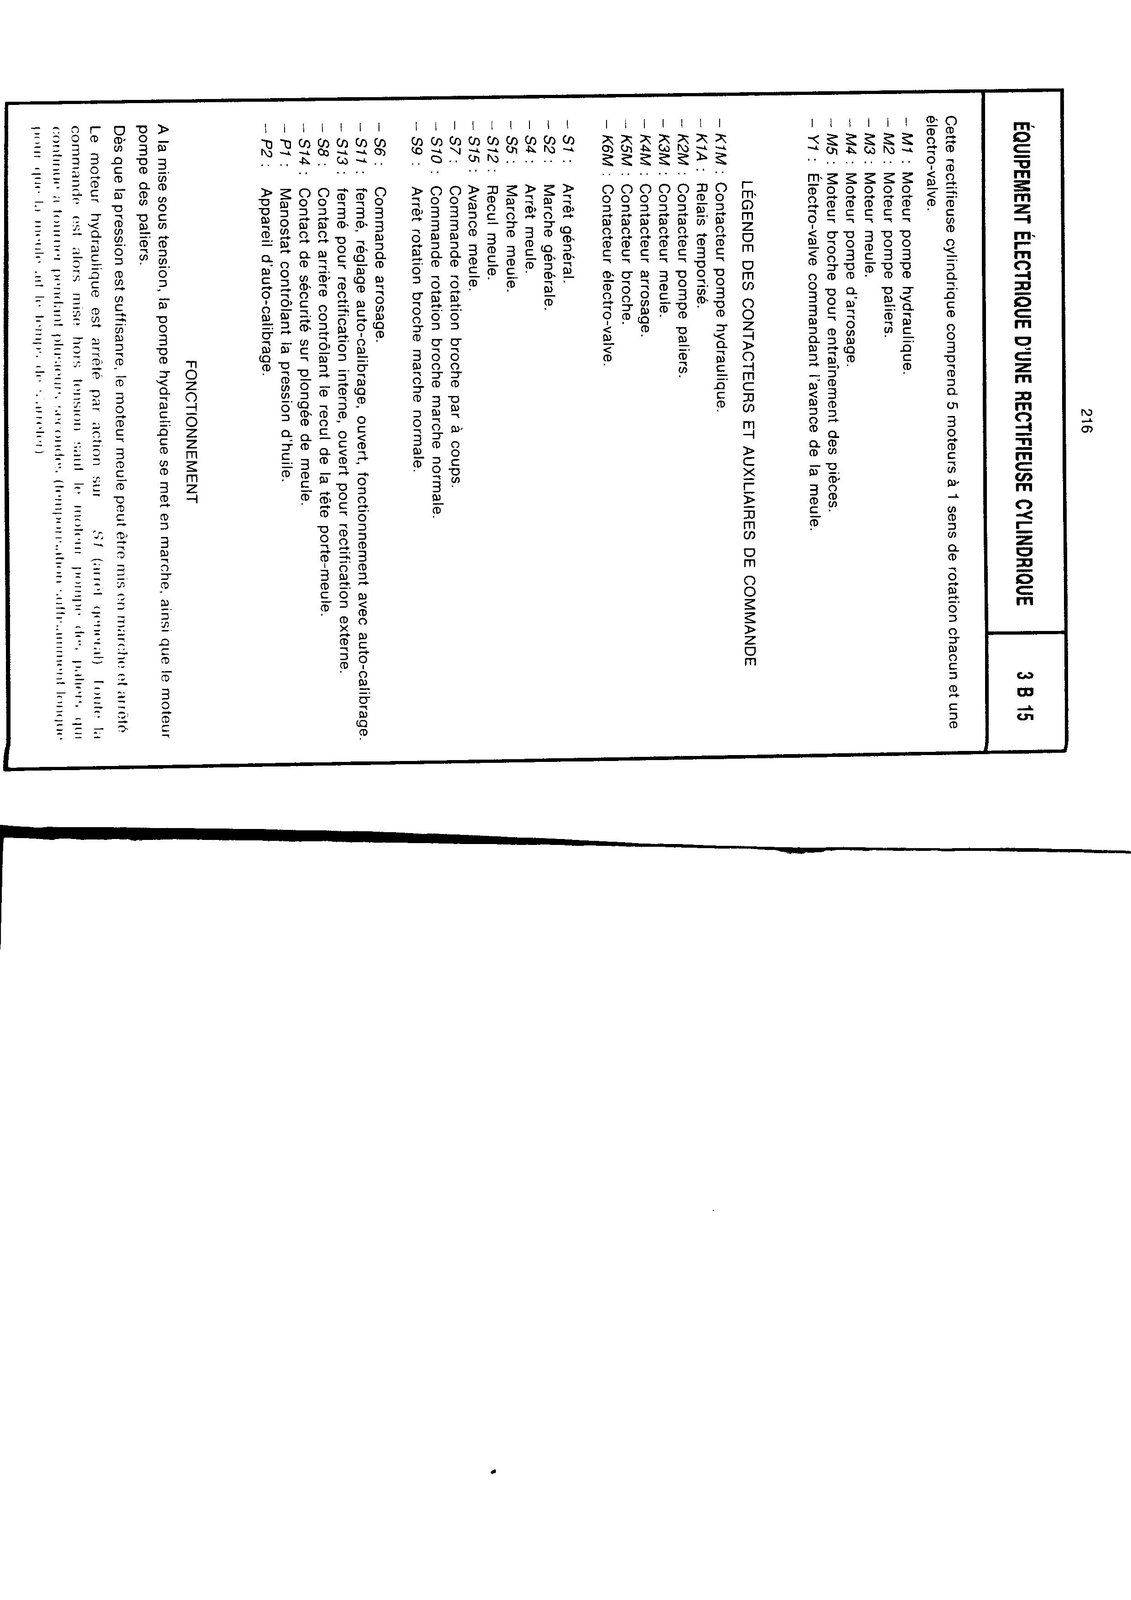 schéma rectif 4,1.jpg